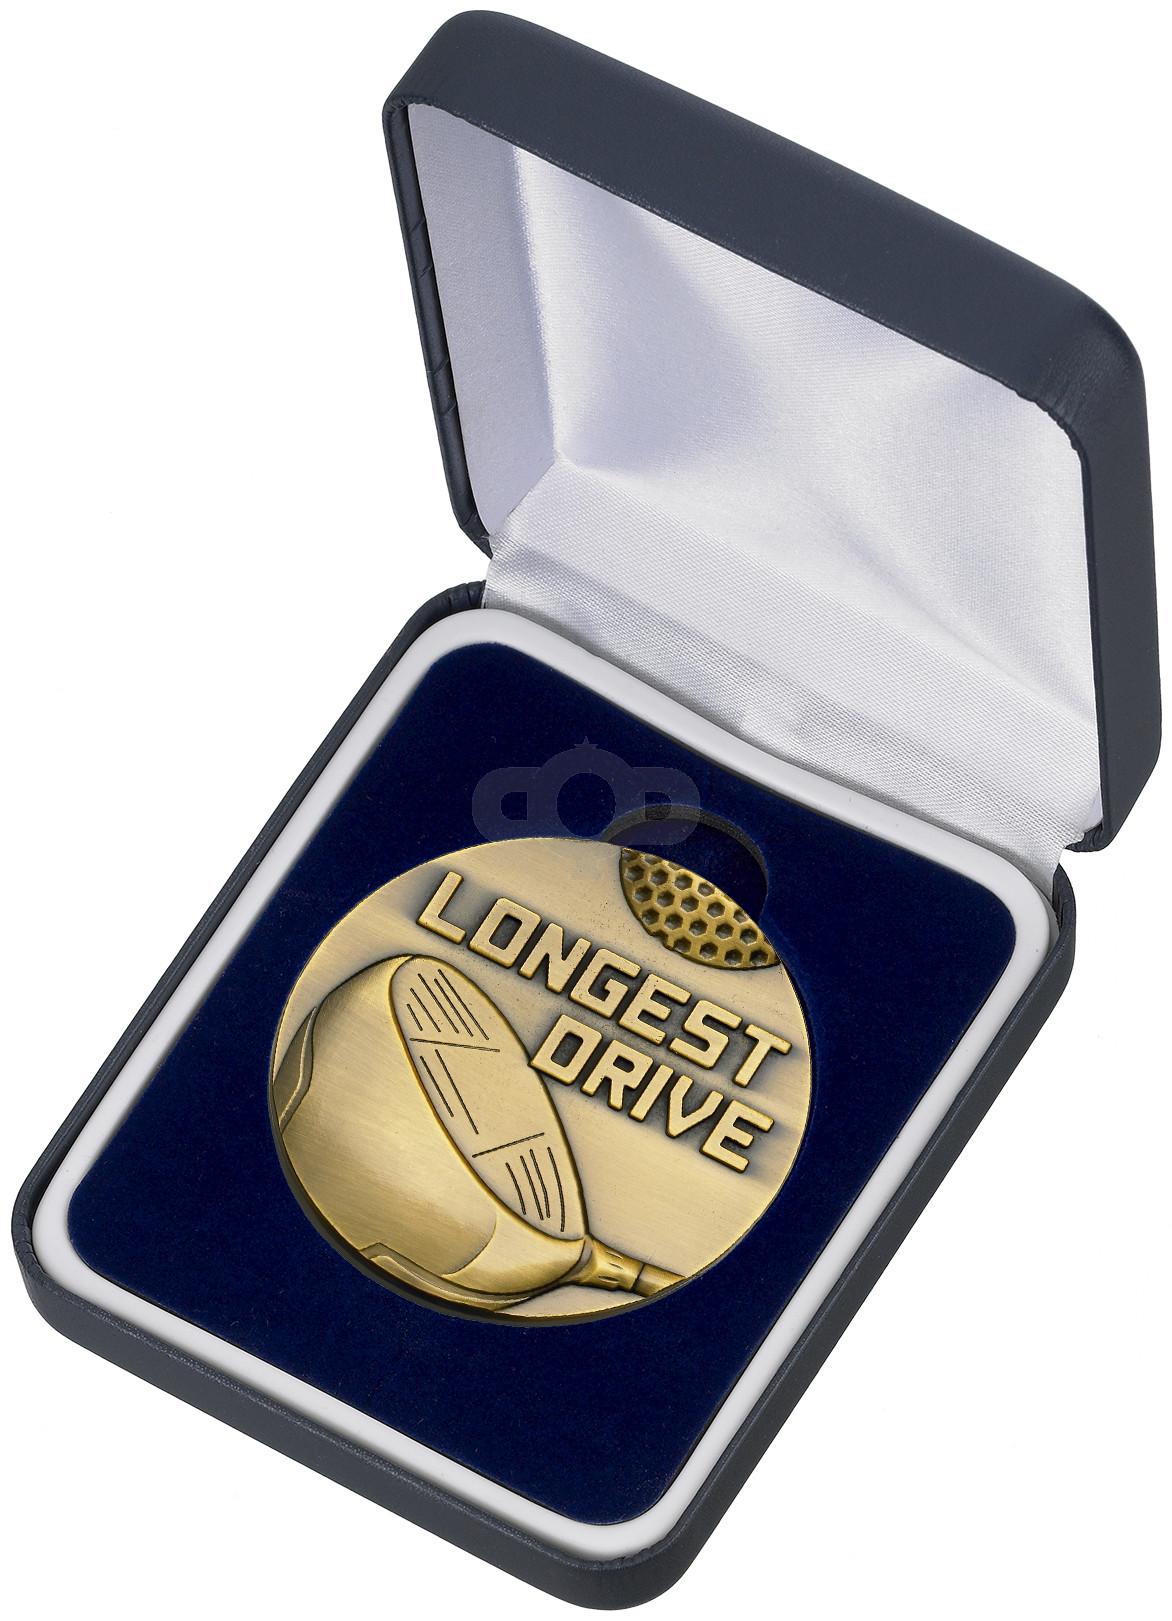 Golf Longest Drive Medal & Box